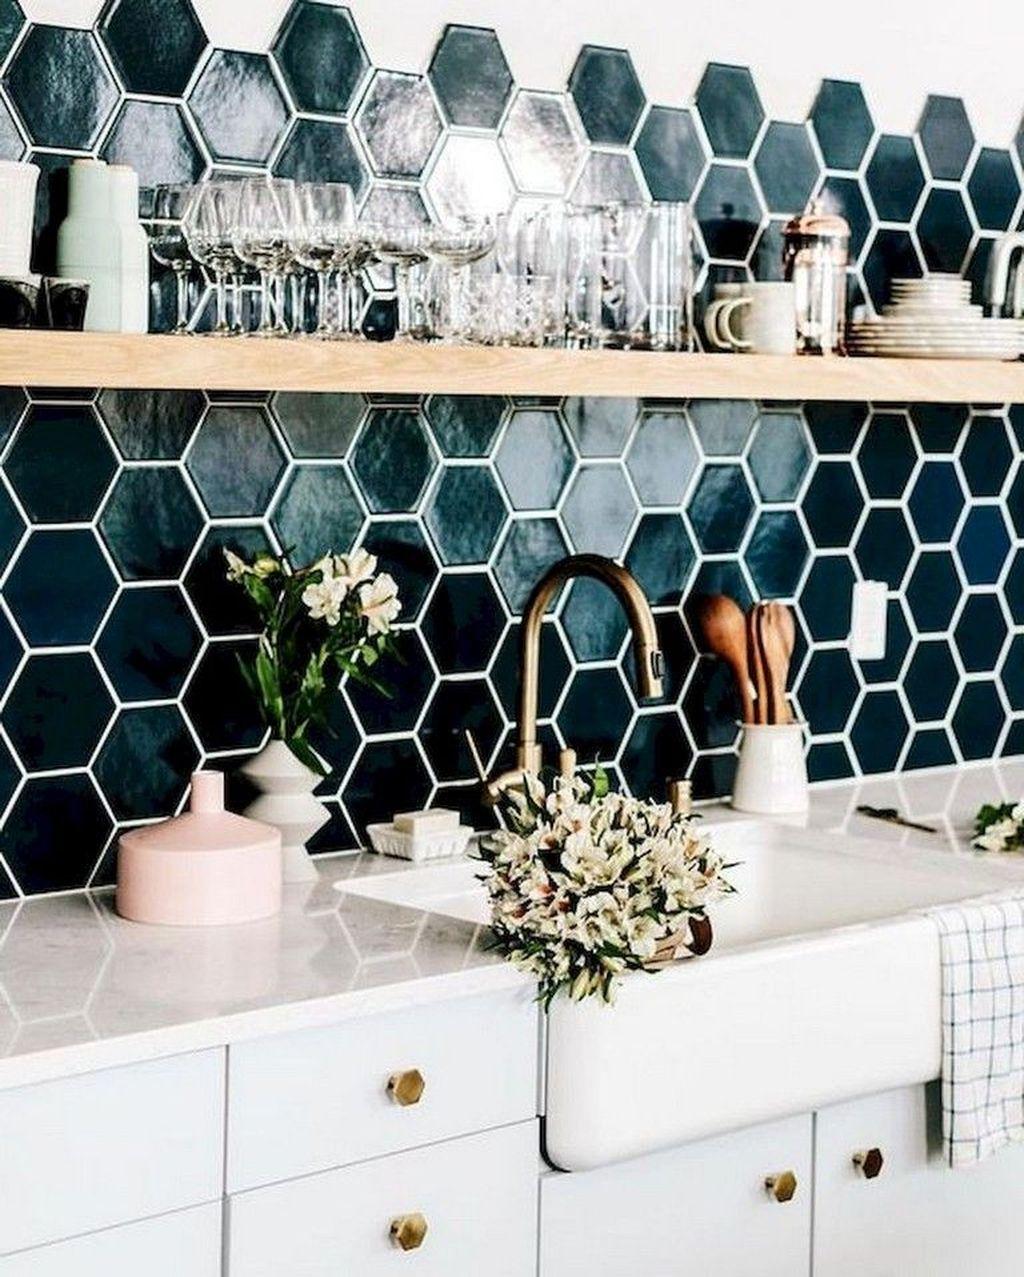 50 luxury home decor ideas home decor kitchen quirky home decor rustic kitchen decor on kitchen ideas quirky id=46070